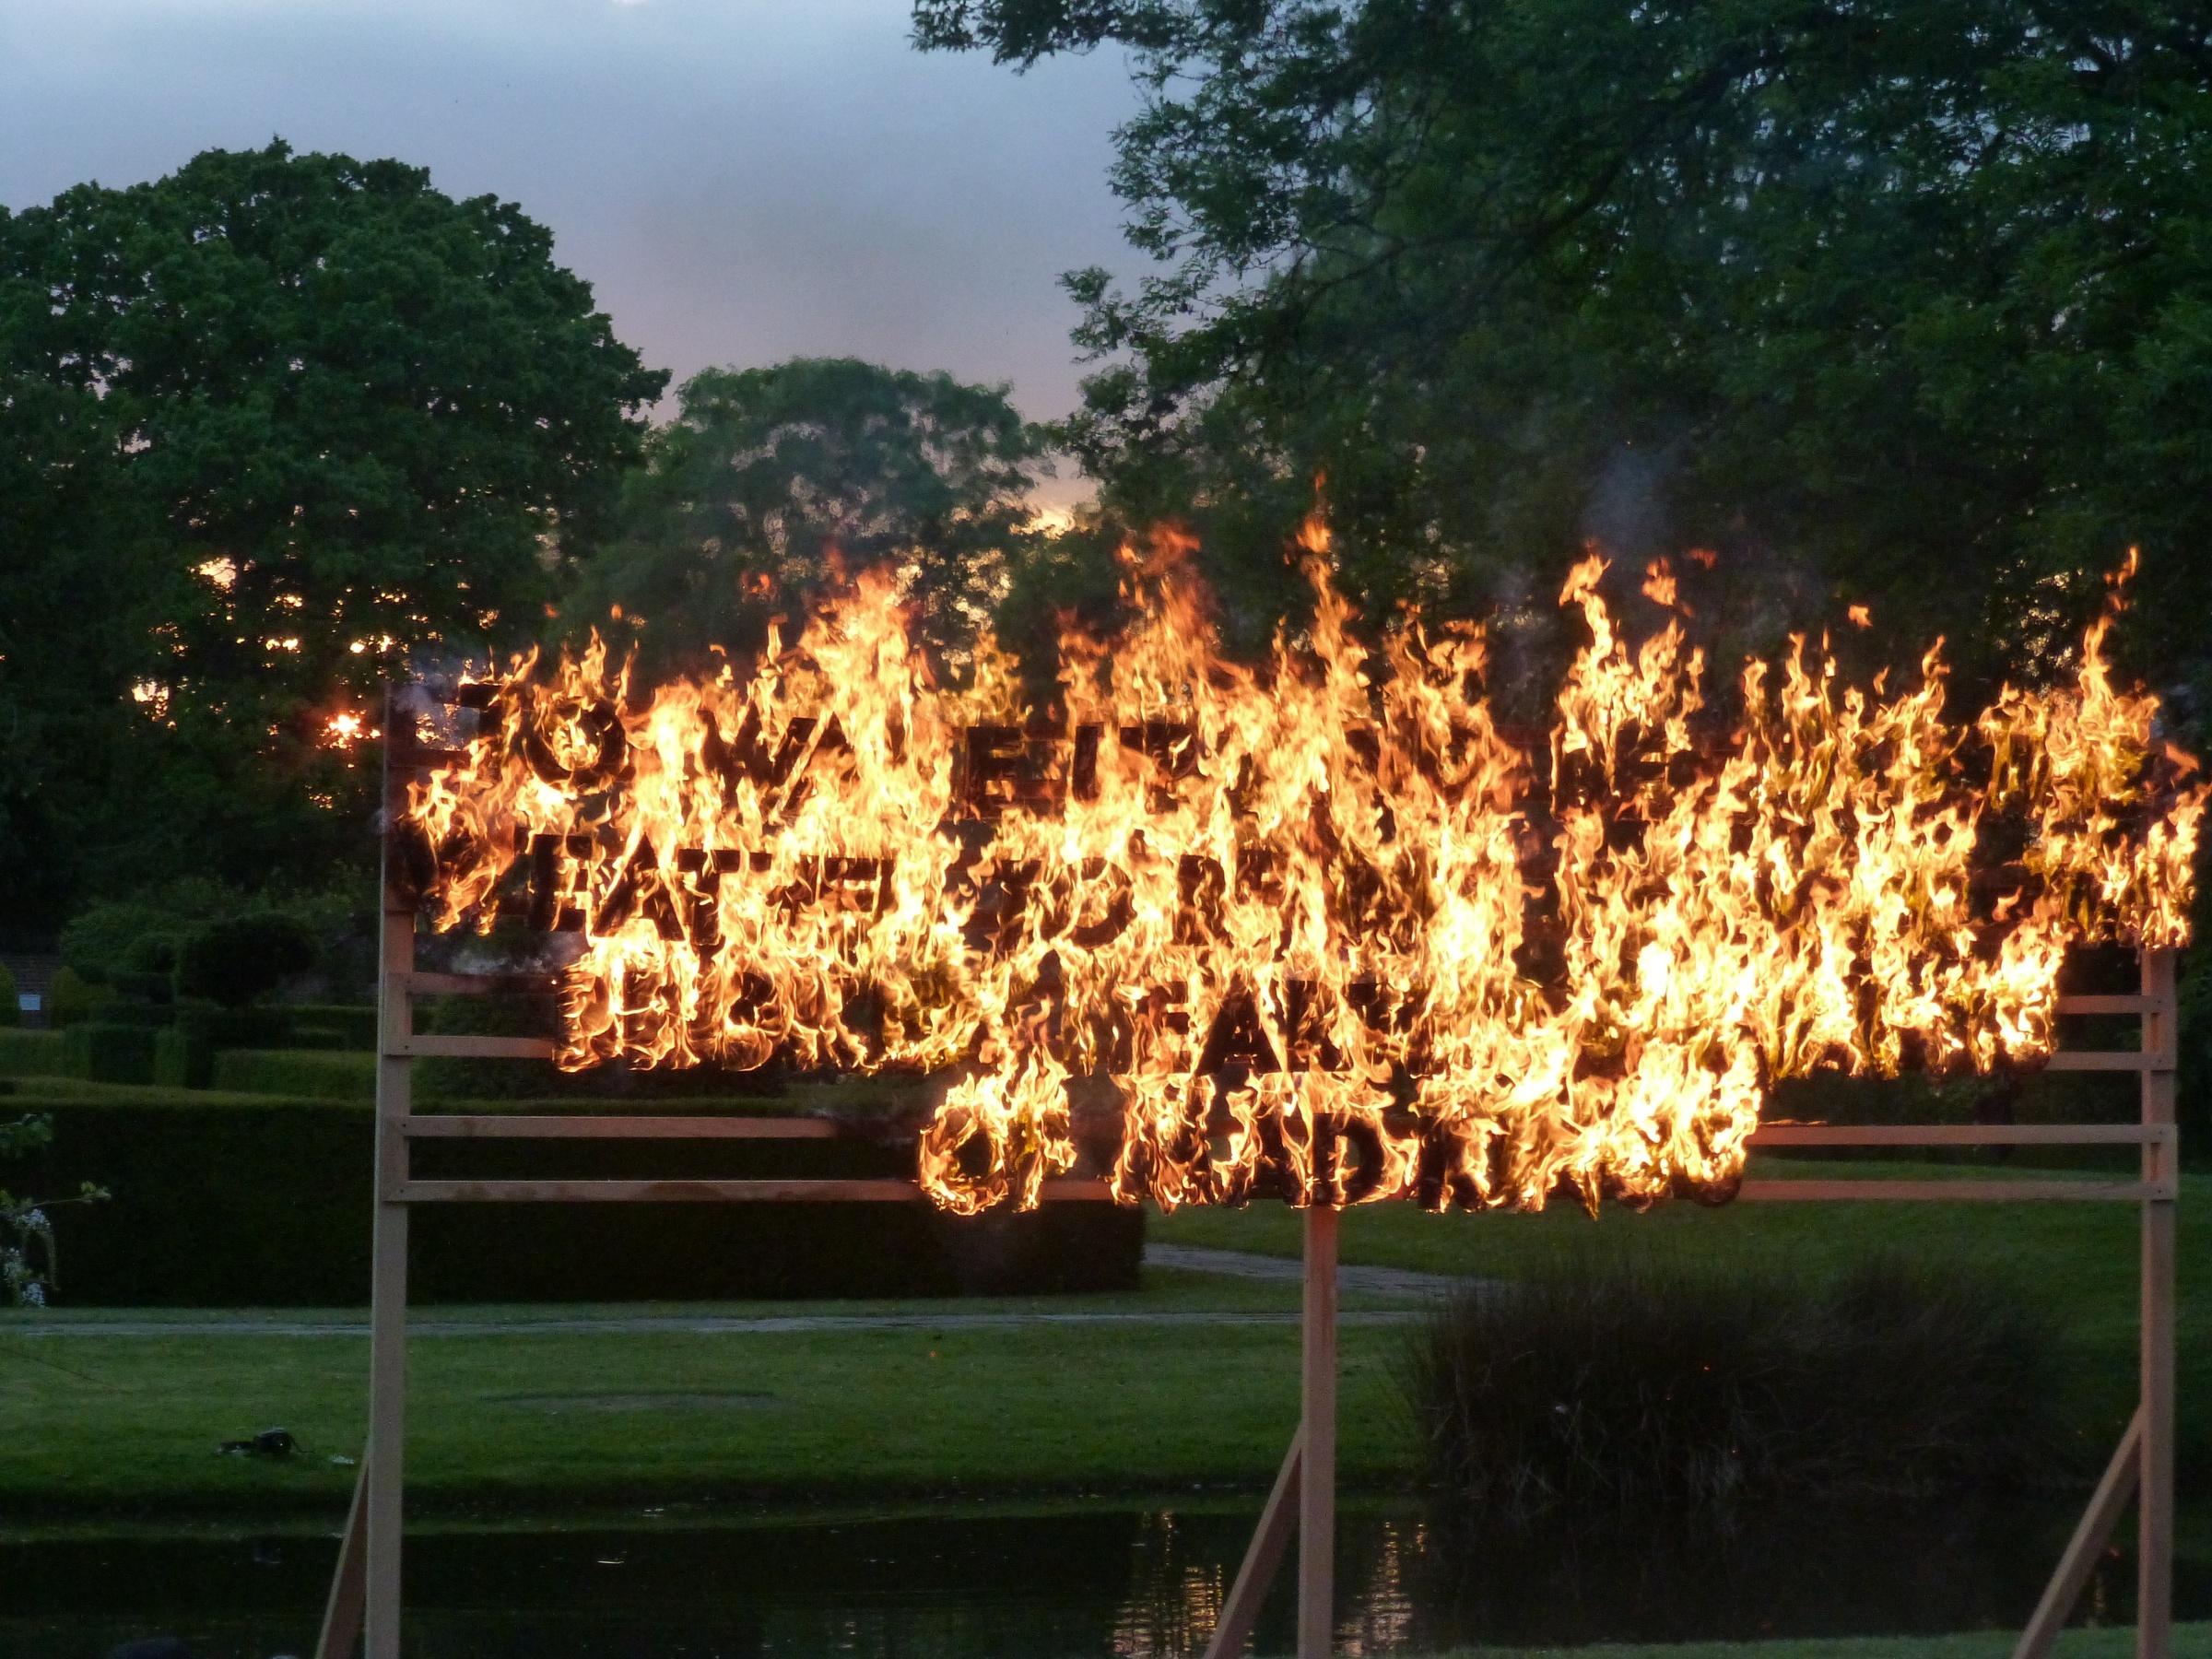 Robert Montgomery - Great Fosters Fire Poem, Great Fosters, Surrey, England, 2013